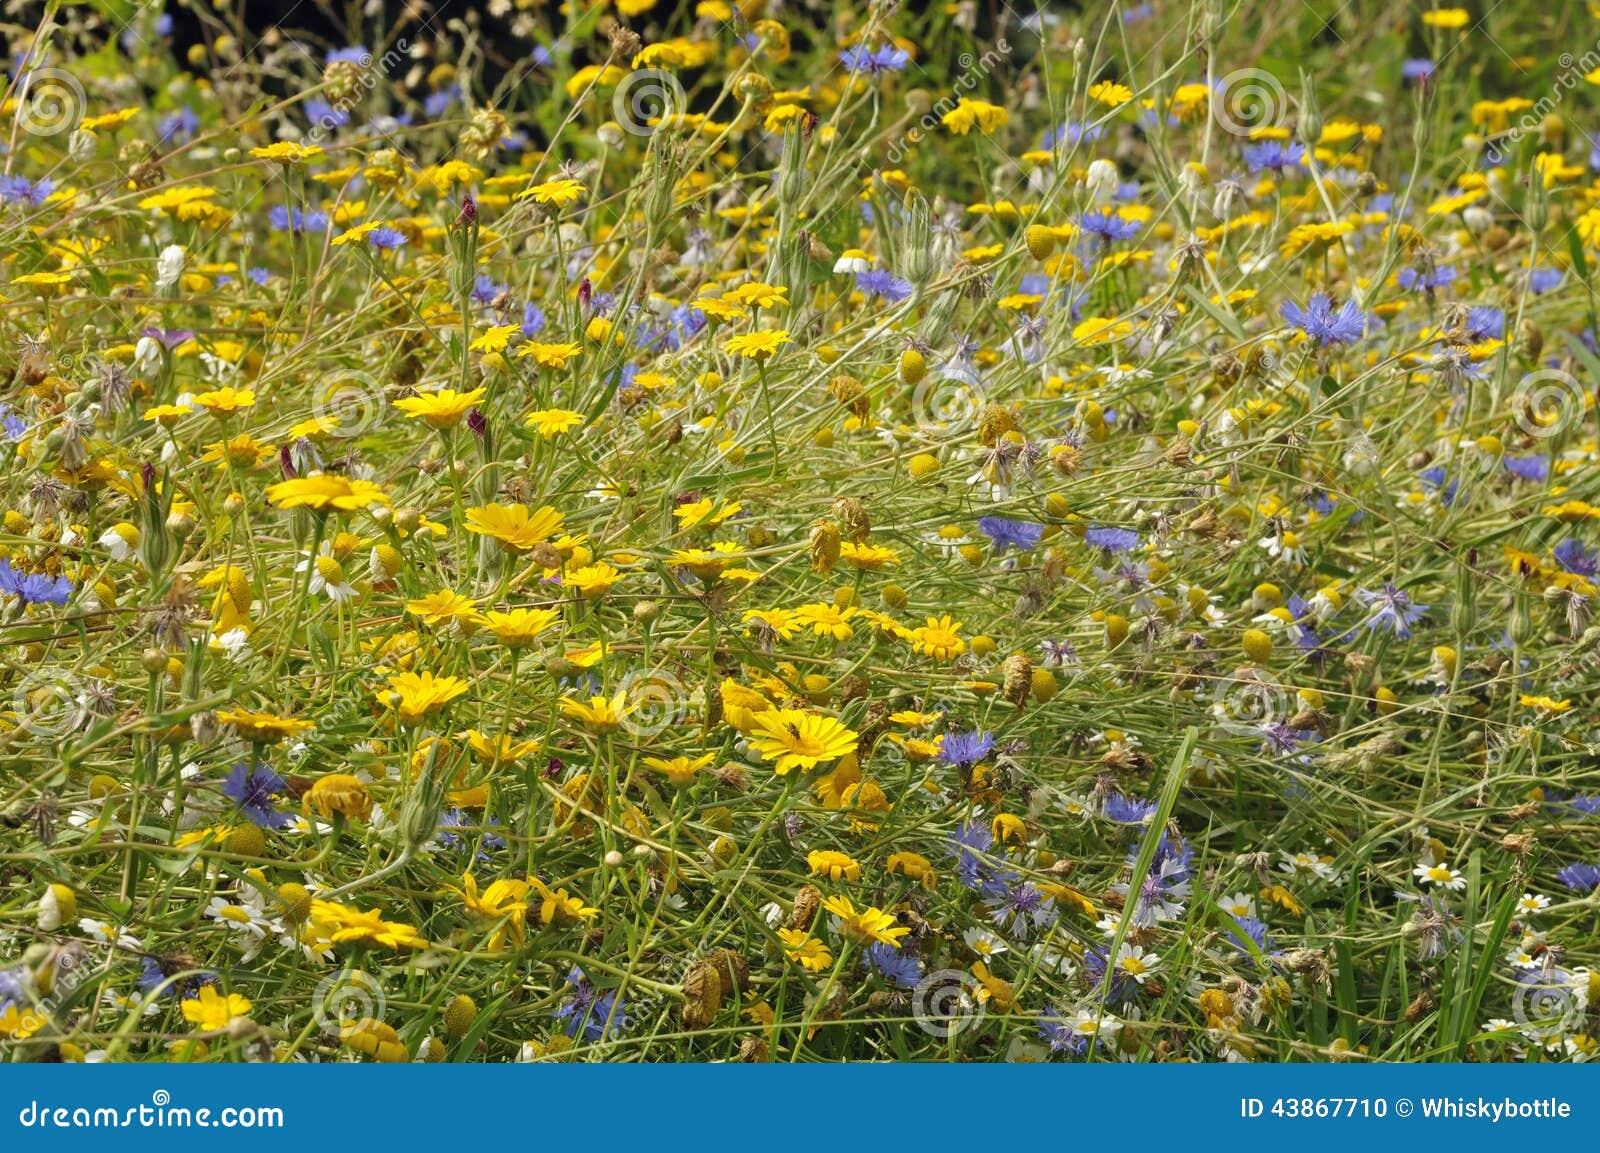 Arable Wild Flowers Stock Photo Image Of Flora Rare 43867710